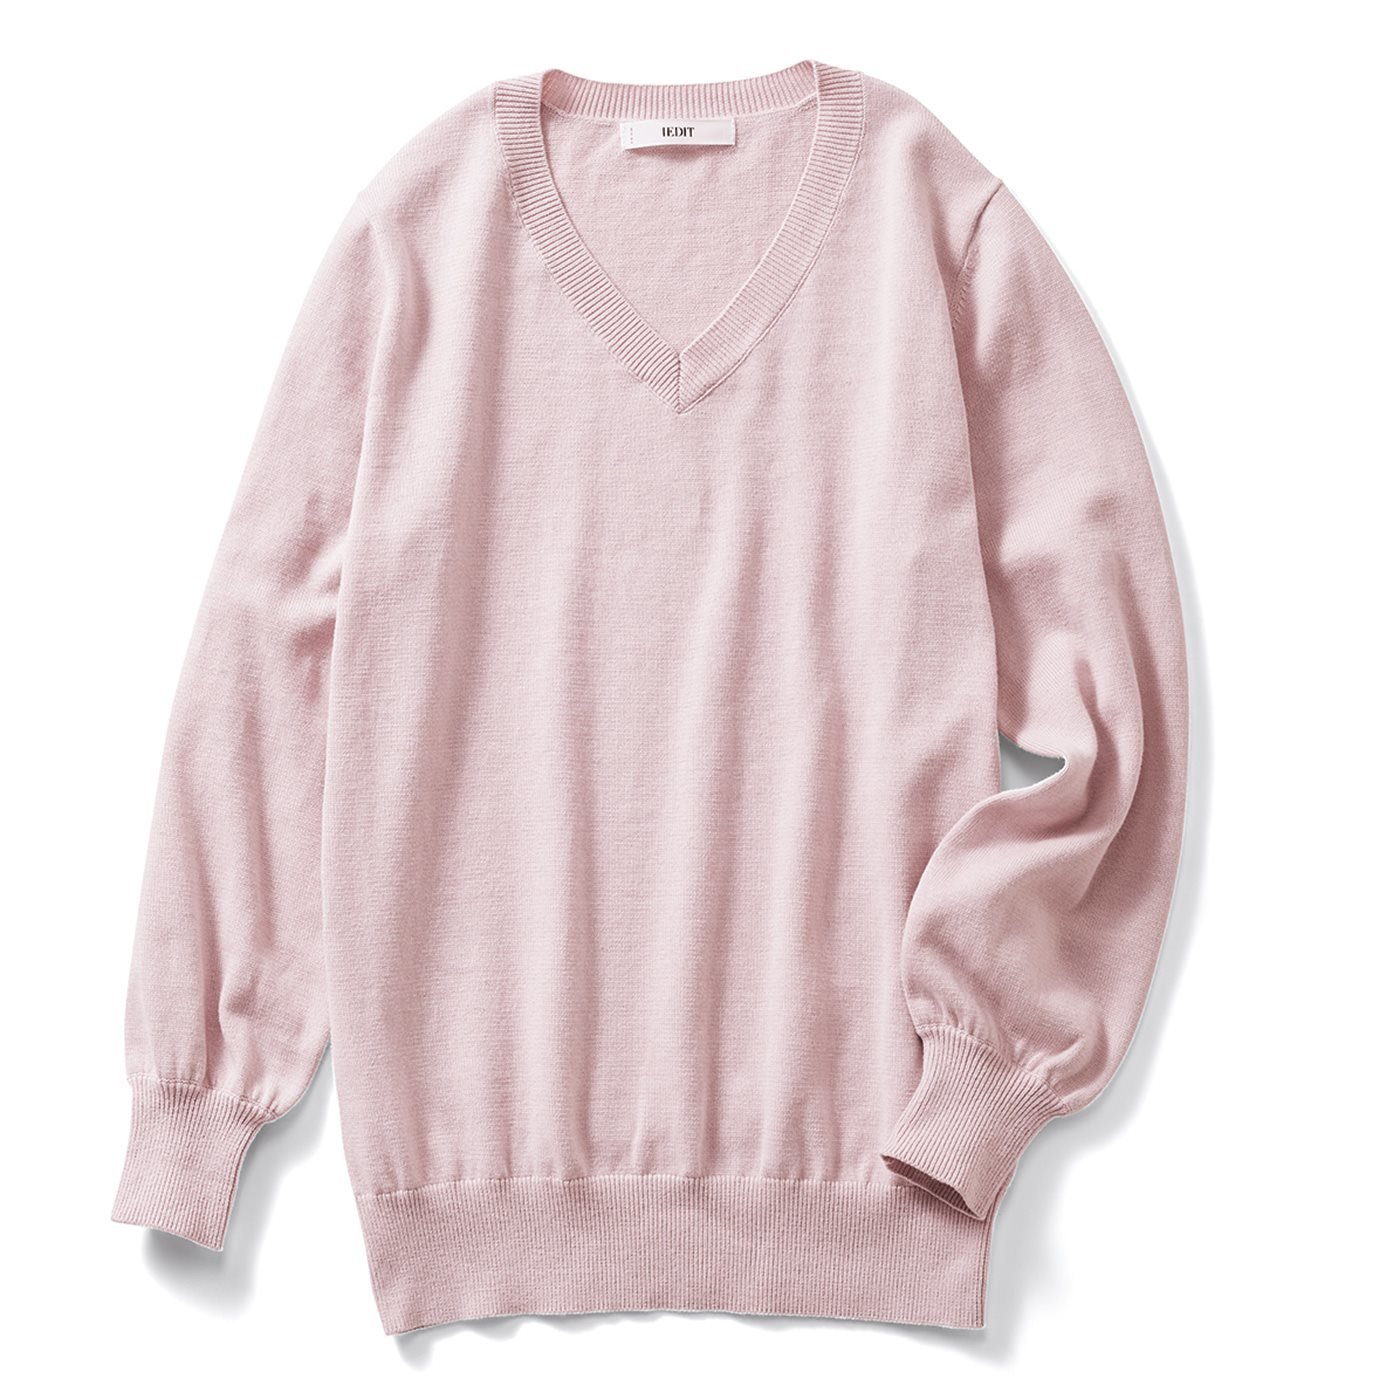 IEDIT[イディット]  コットンシルク素材の ハイゲージVネックニット〈ピンク〉